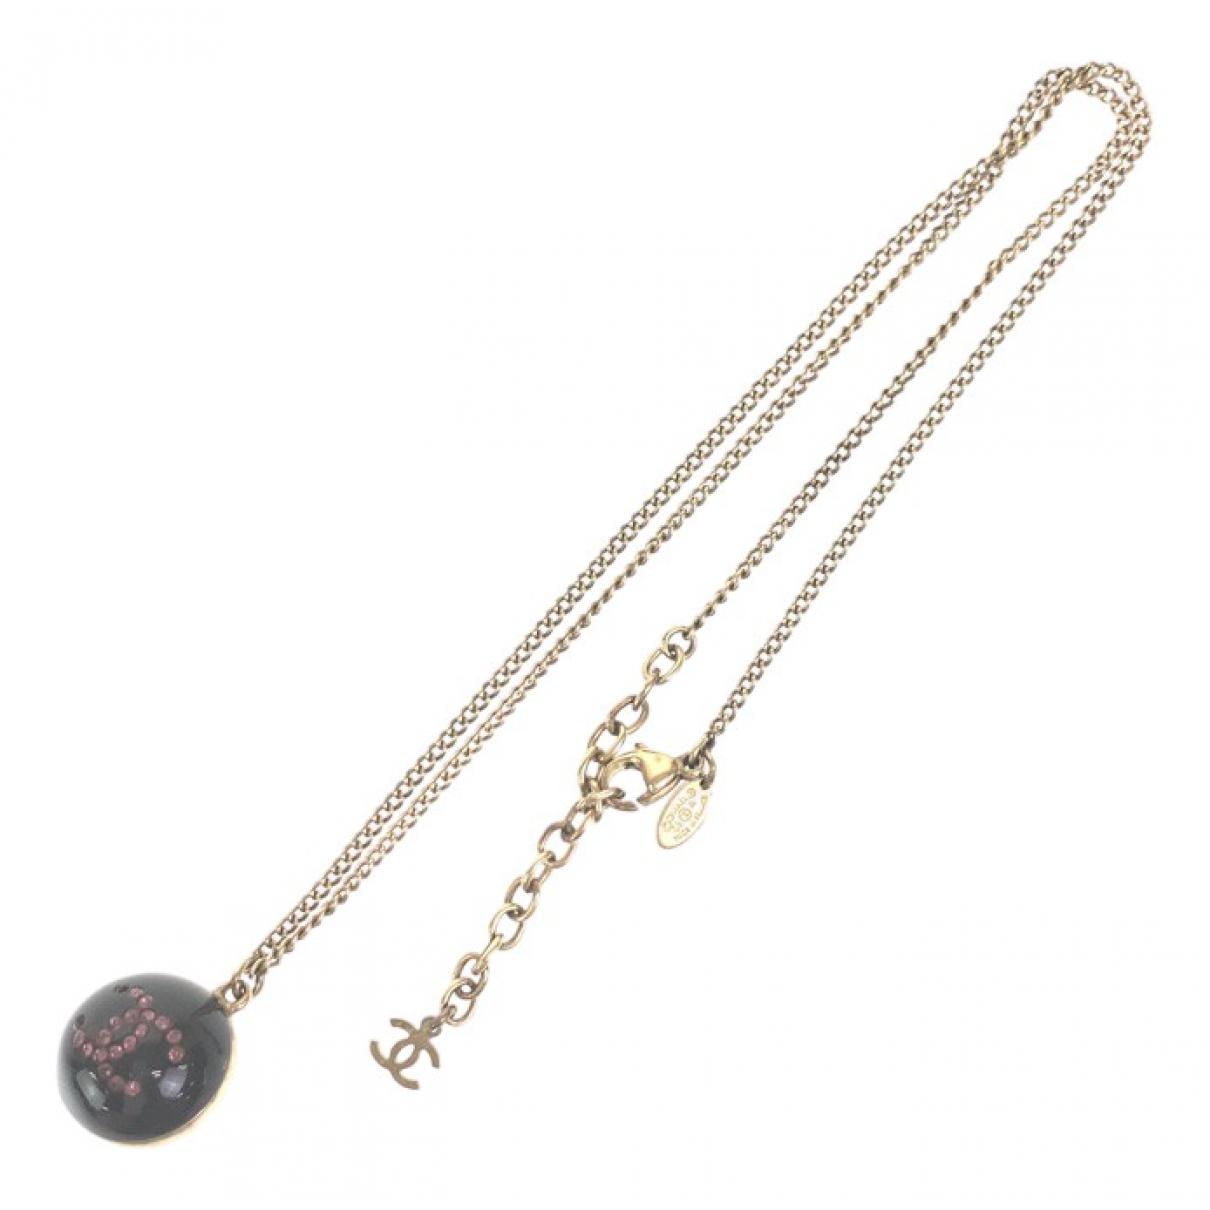 Chanel CC Kette in  Schwarz Metall